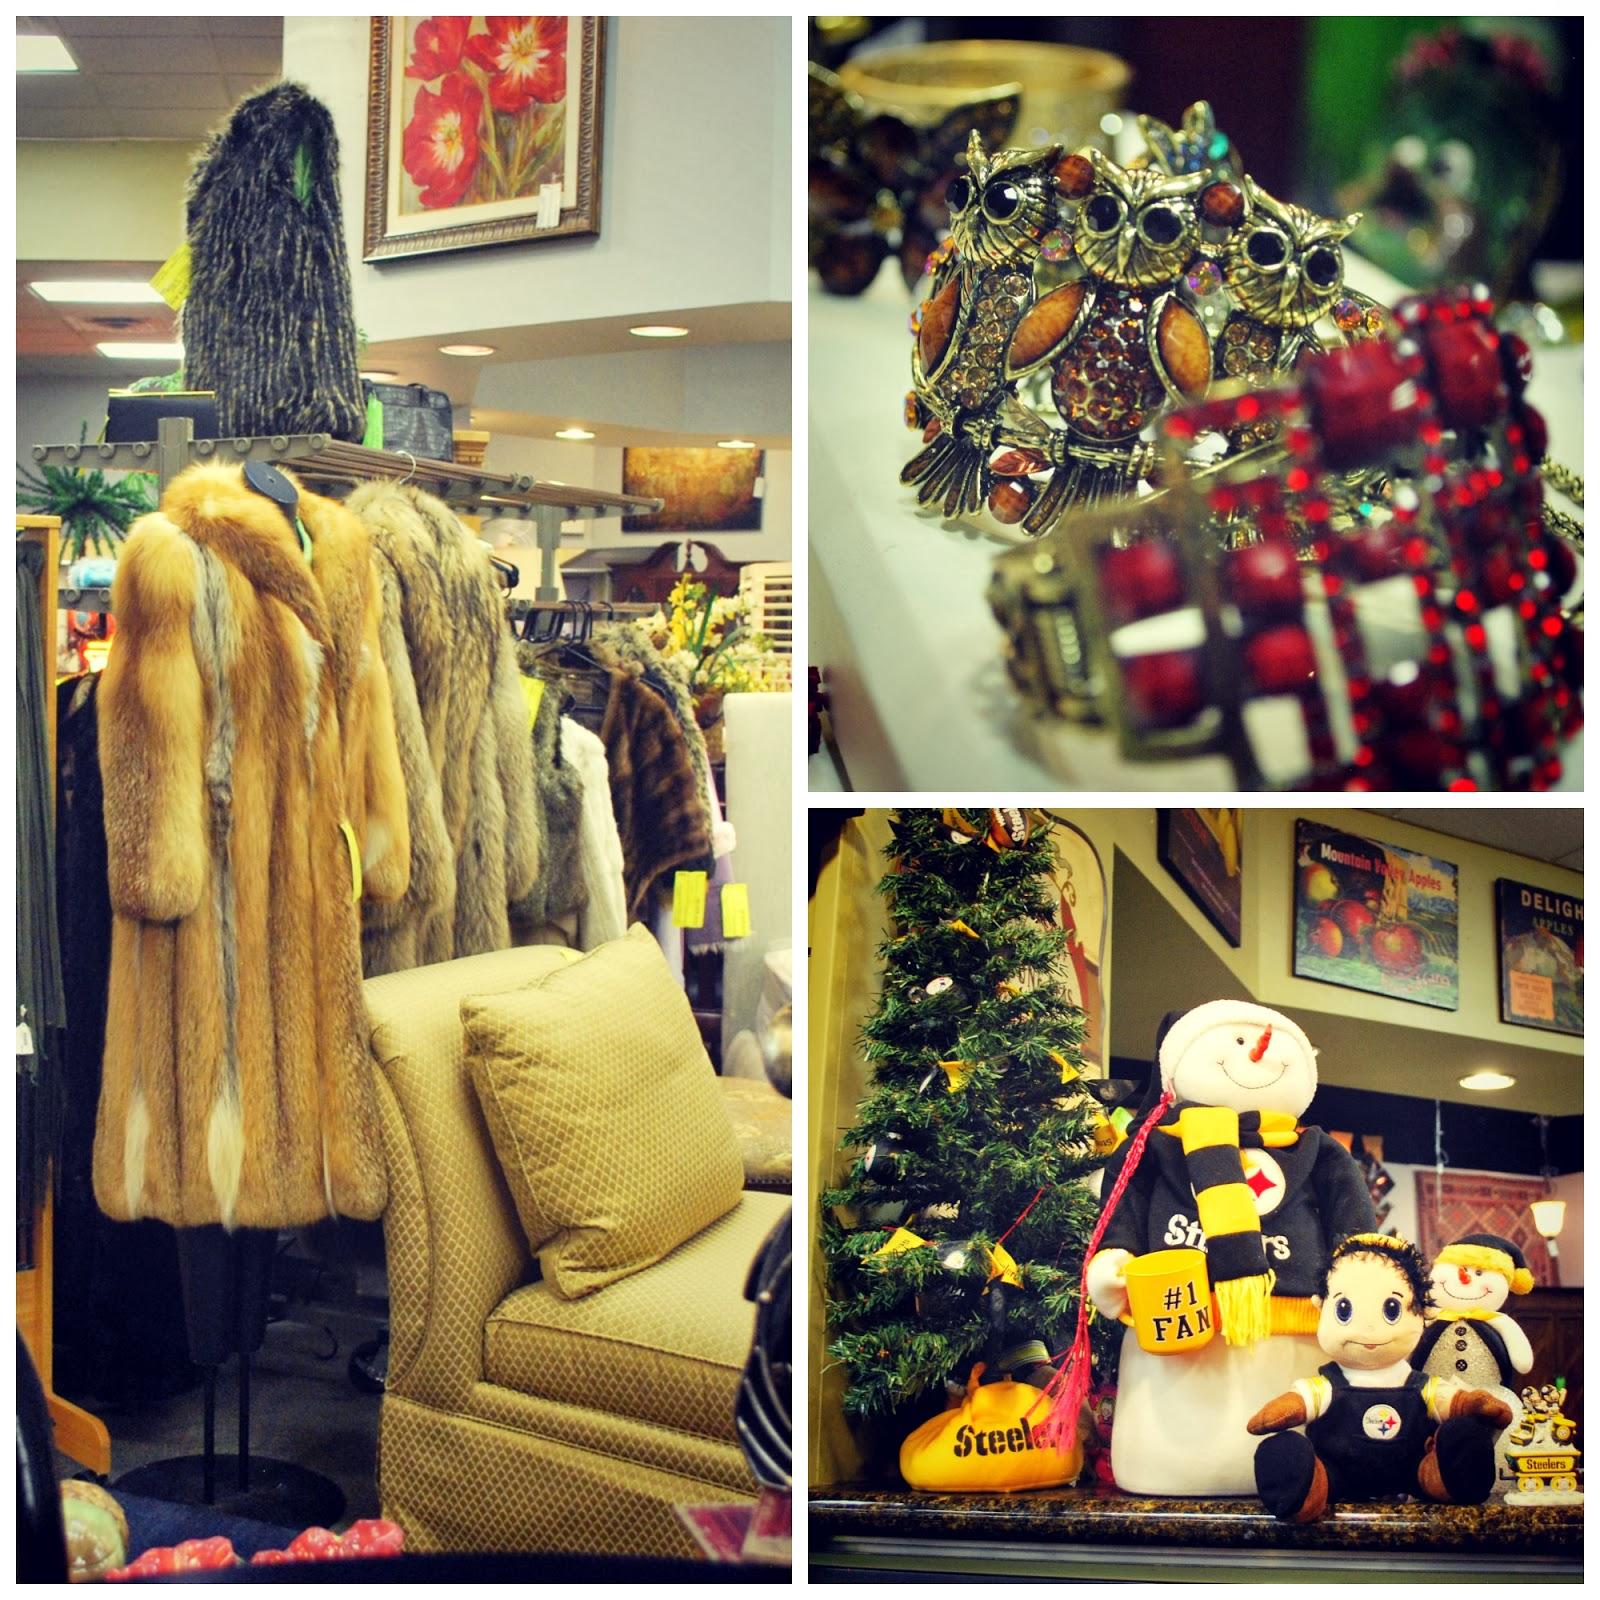 Atlanta Consignment Stores: Tucci's Unique Furnishings